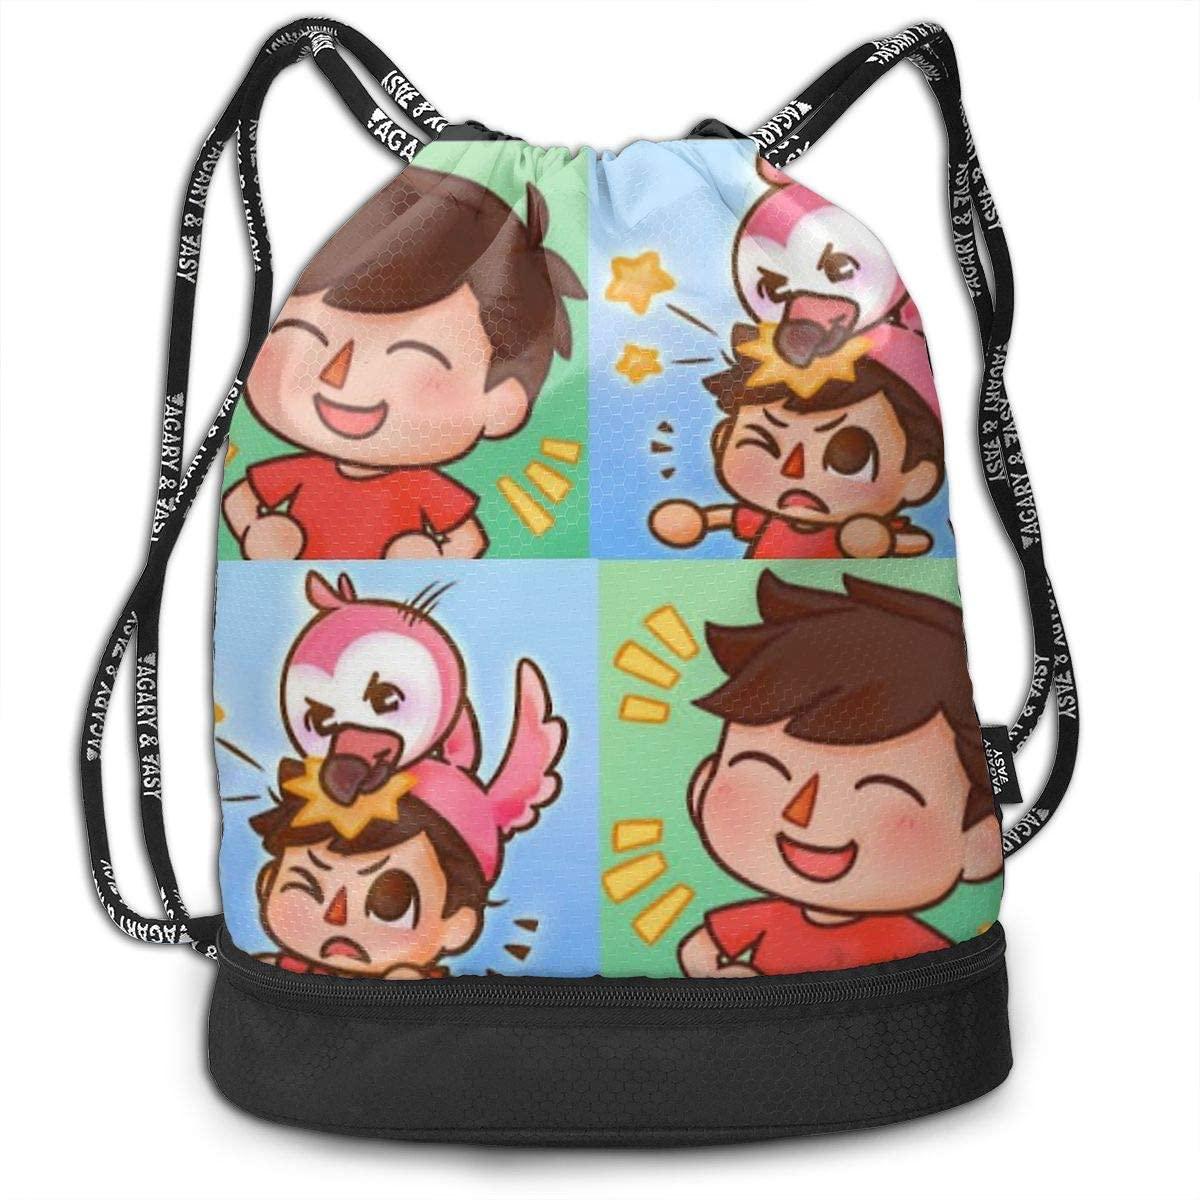 9jiuguiyi Albertsstuff Flamingo Drawstring Bags Multifunction Bundle Backpack Large Capacity Lightweight Simple Portable for Women Kids School Gym Travel